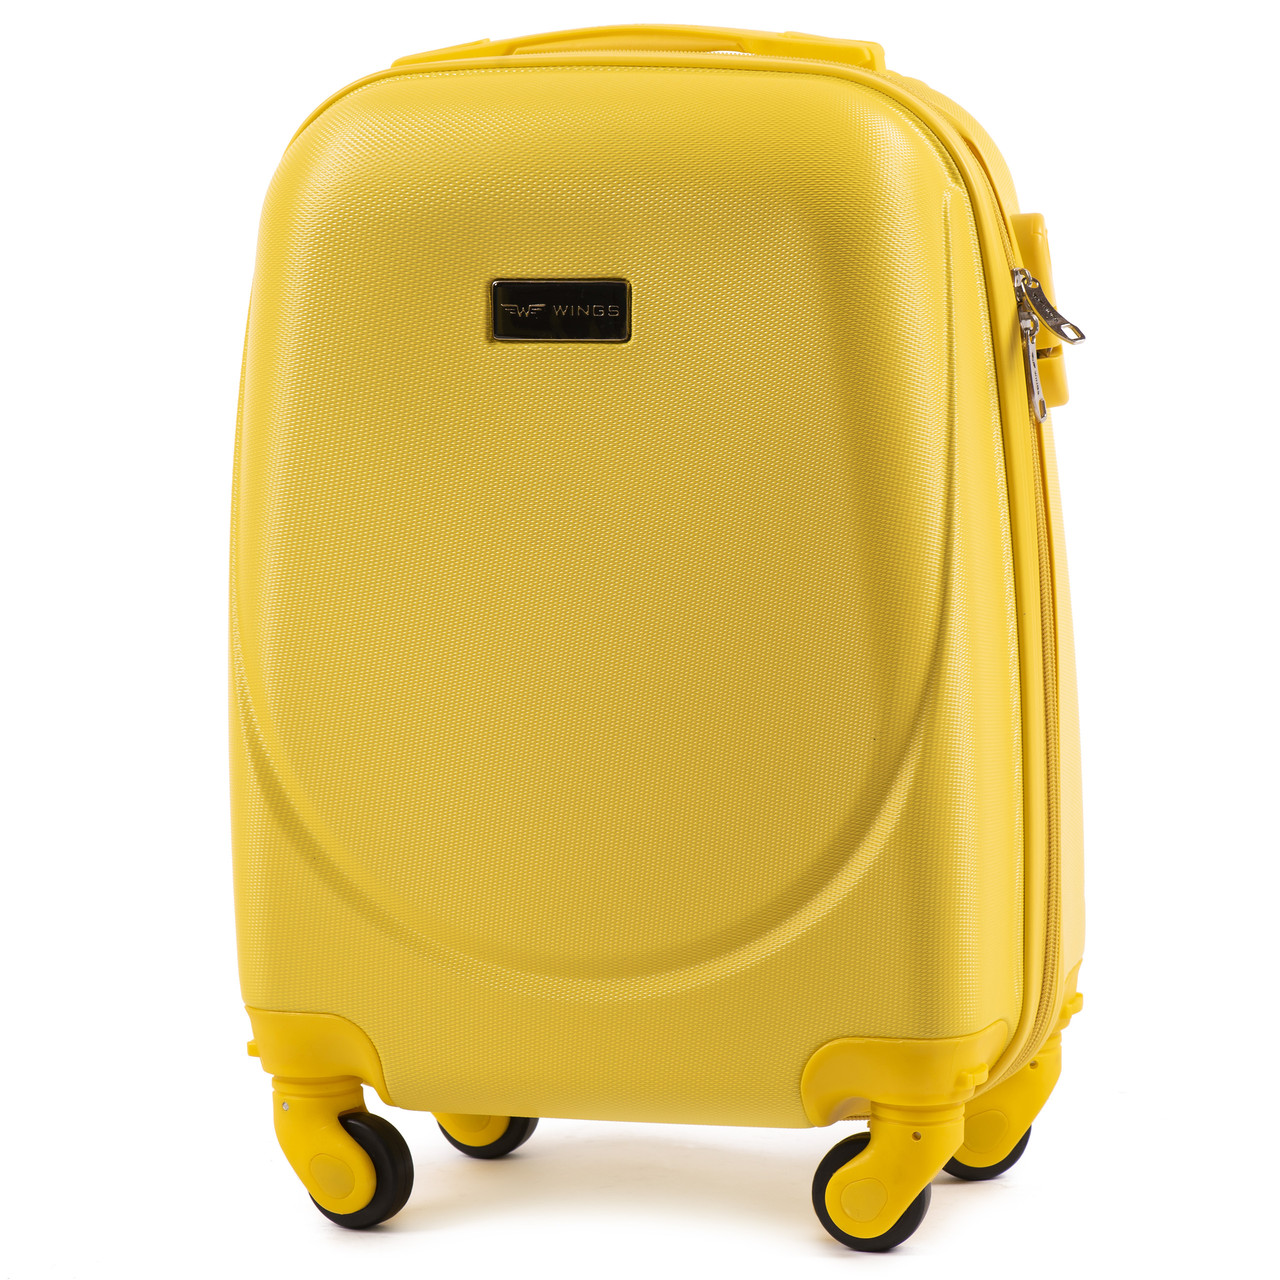 Чемодан маленький на колесах Wings 912 Ручная кладь (S) Желтый